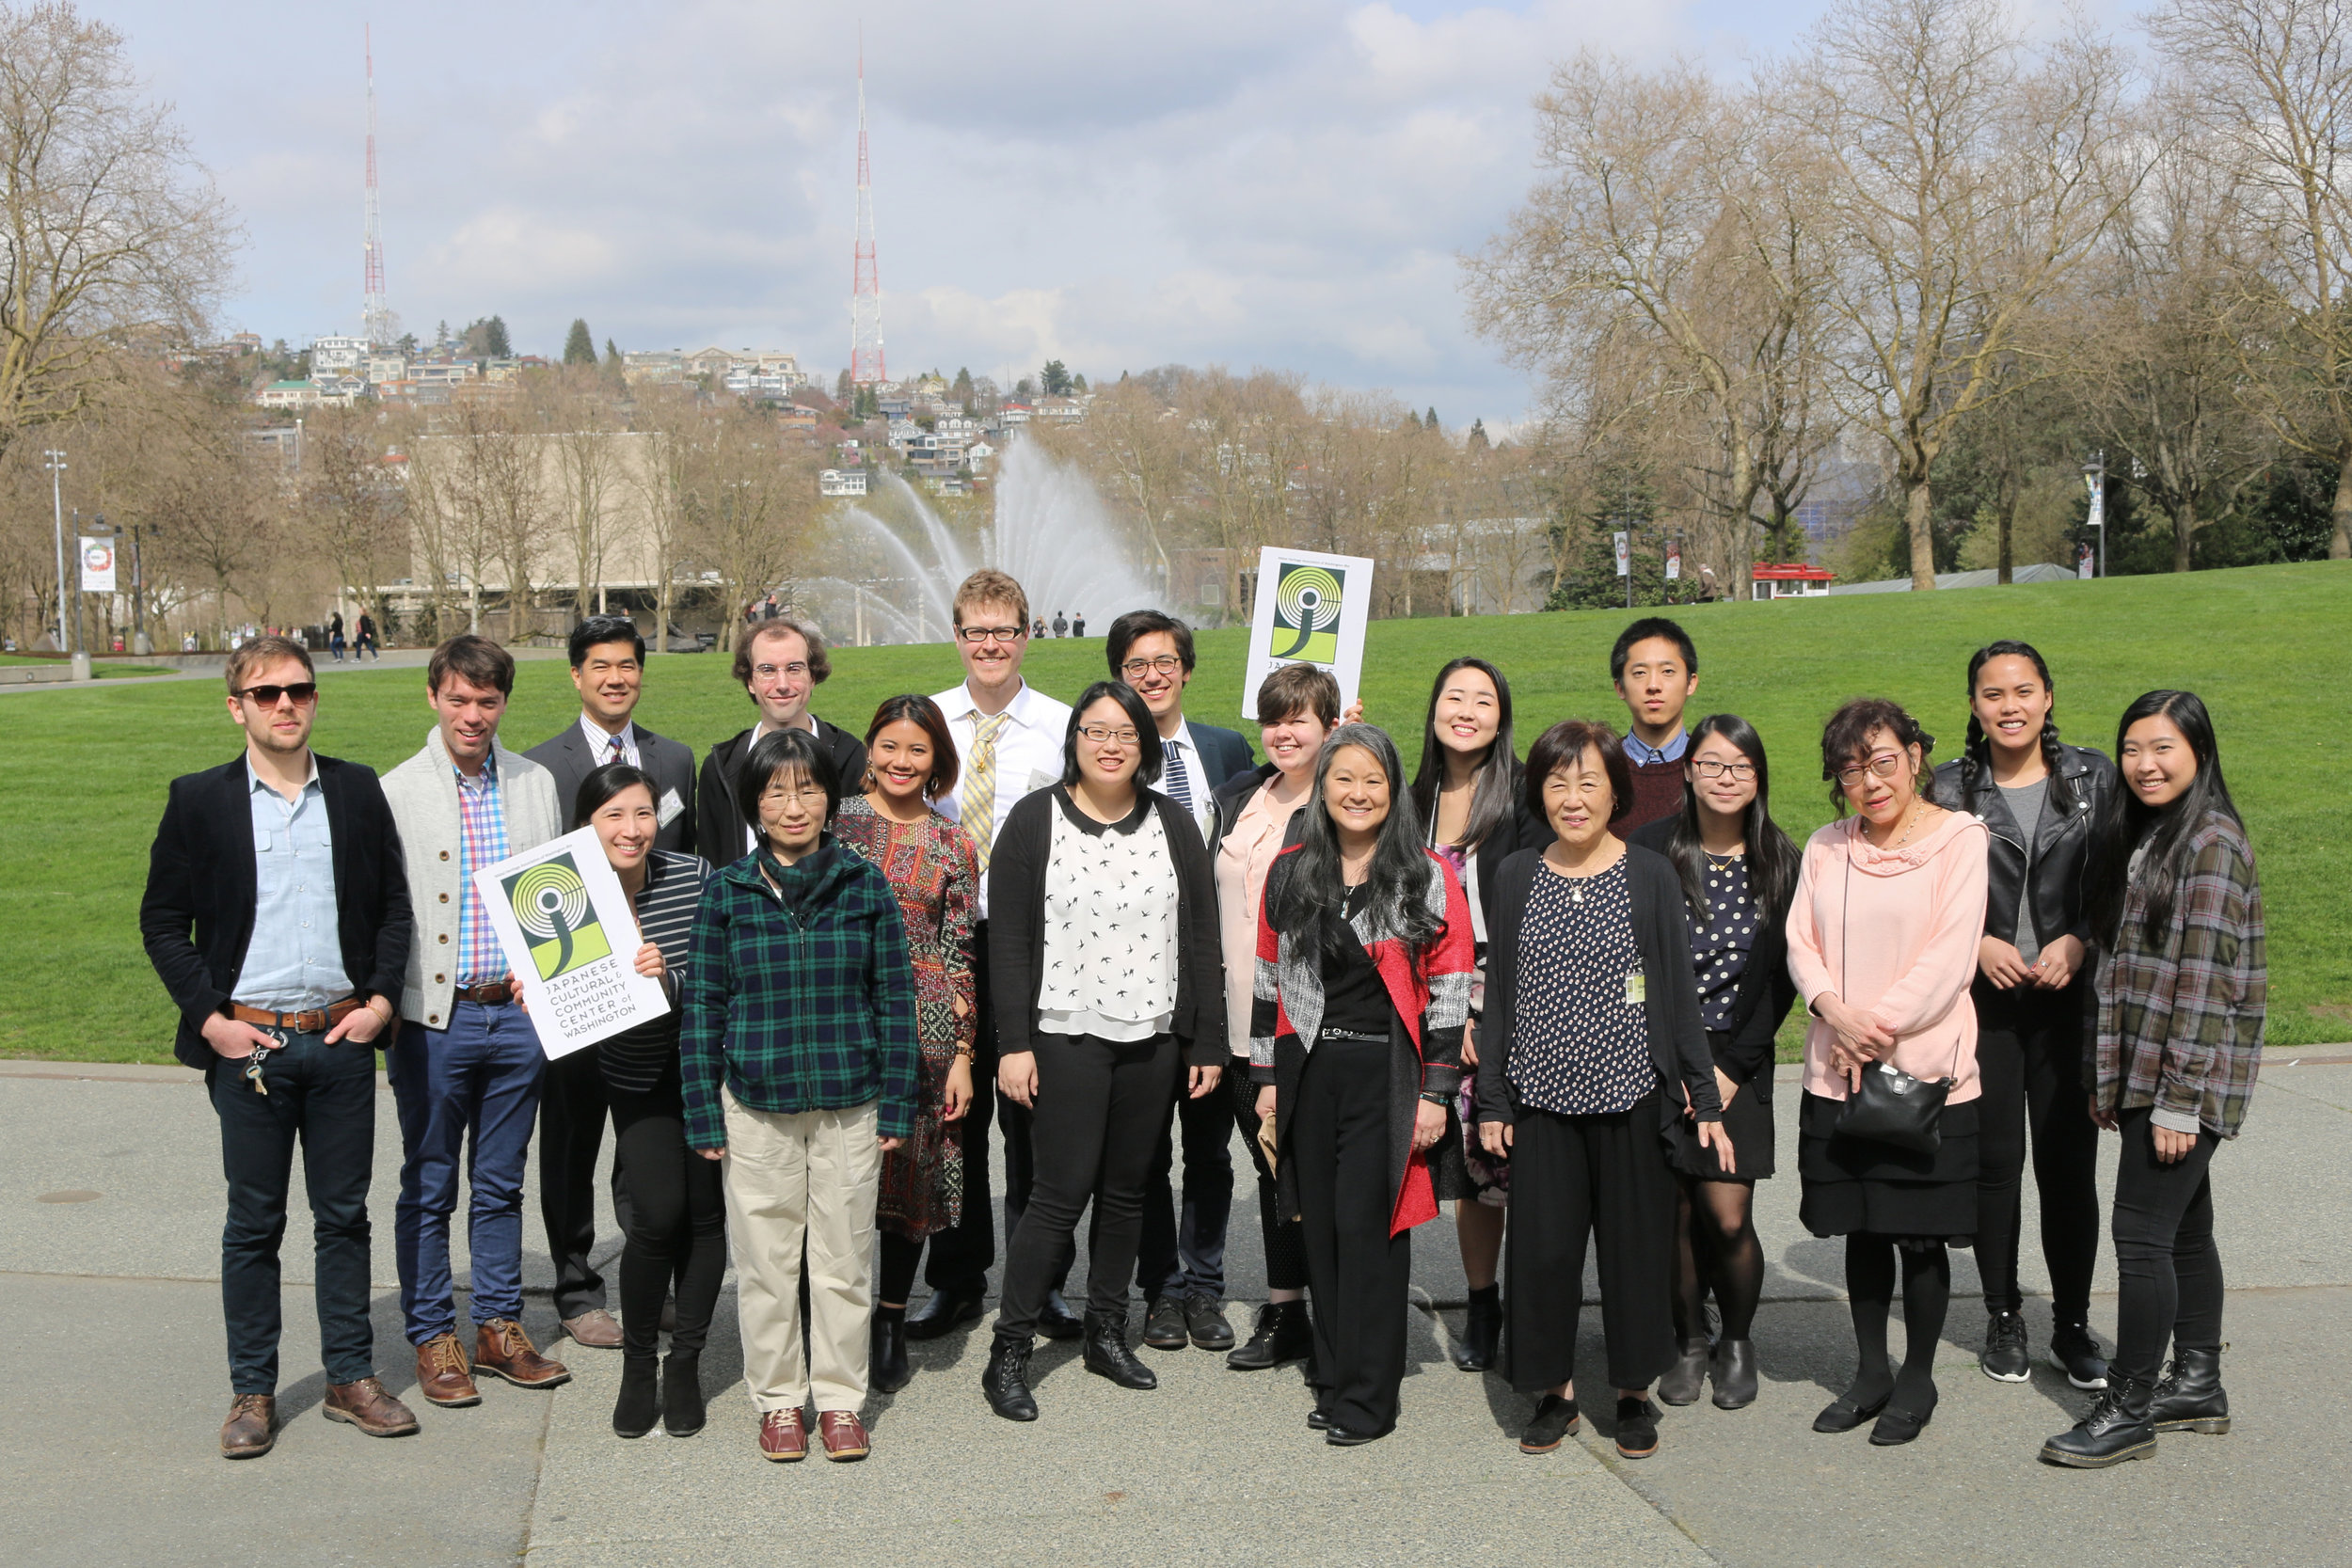 jcccw-staff-group-photo.JPG